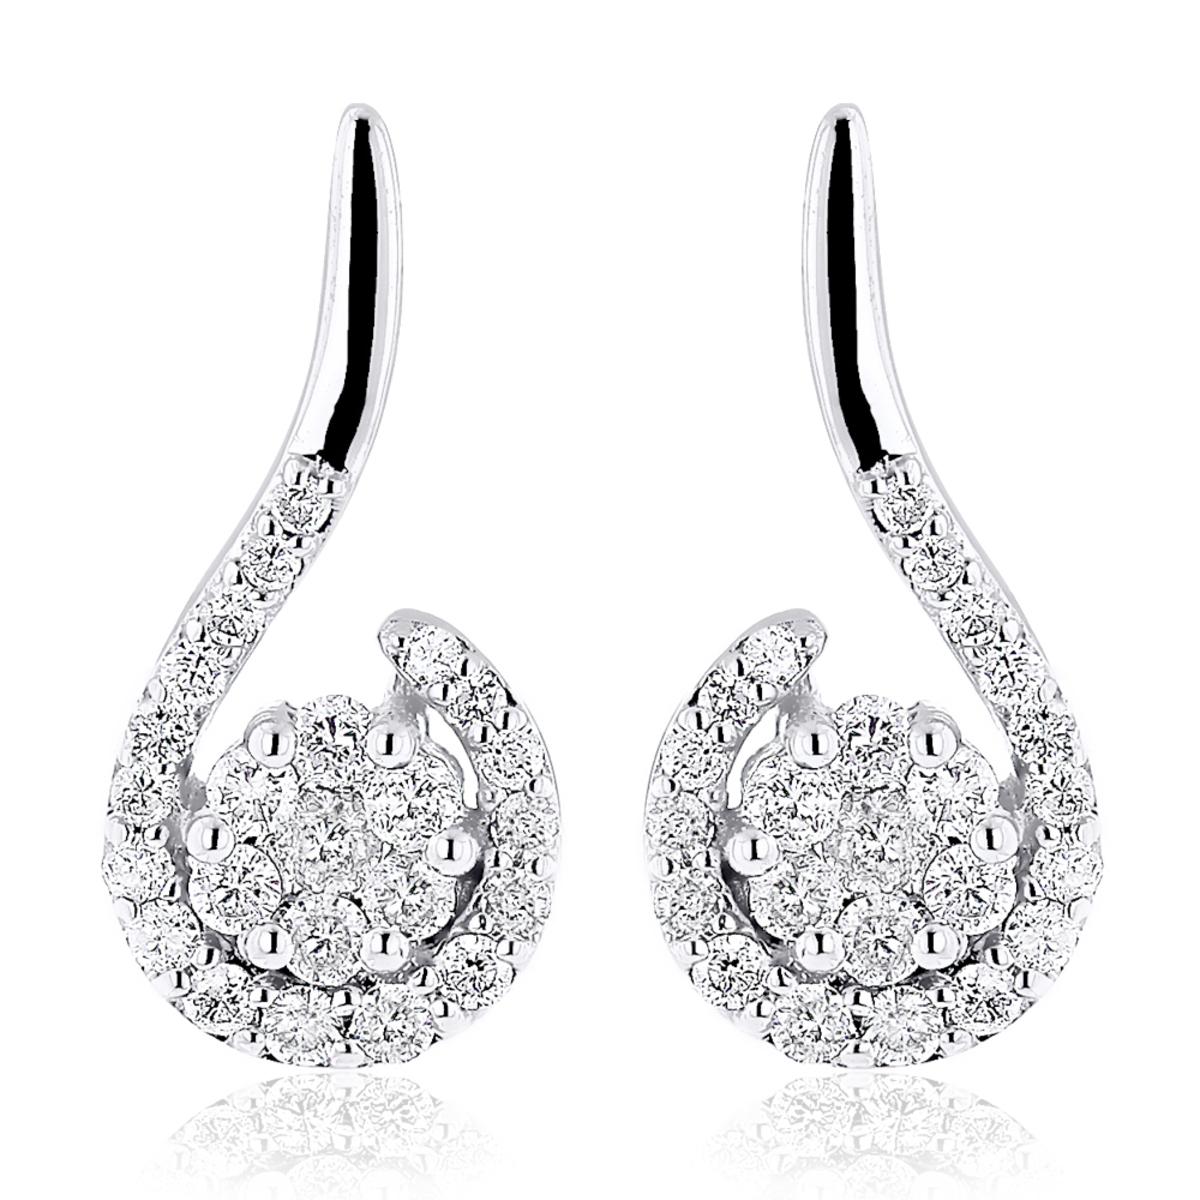 14K Gold Swirl Diamond Earrings for Women 0.75ct